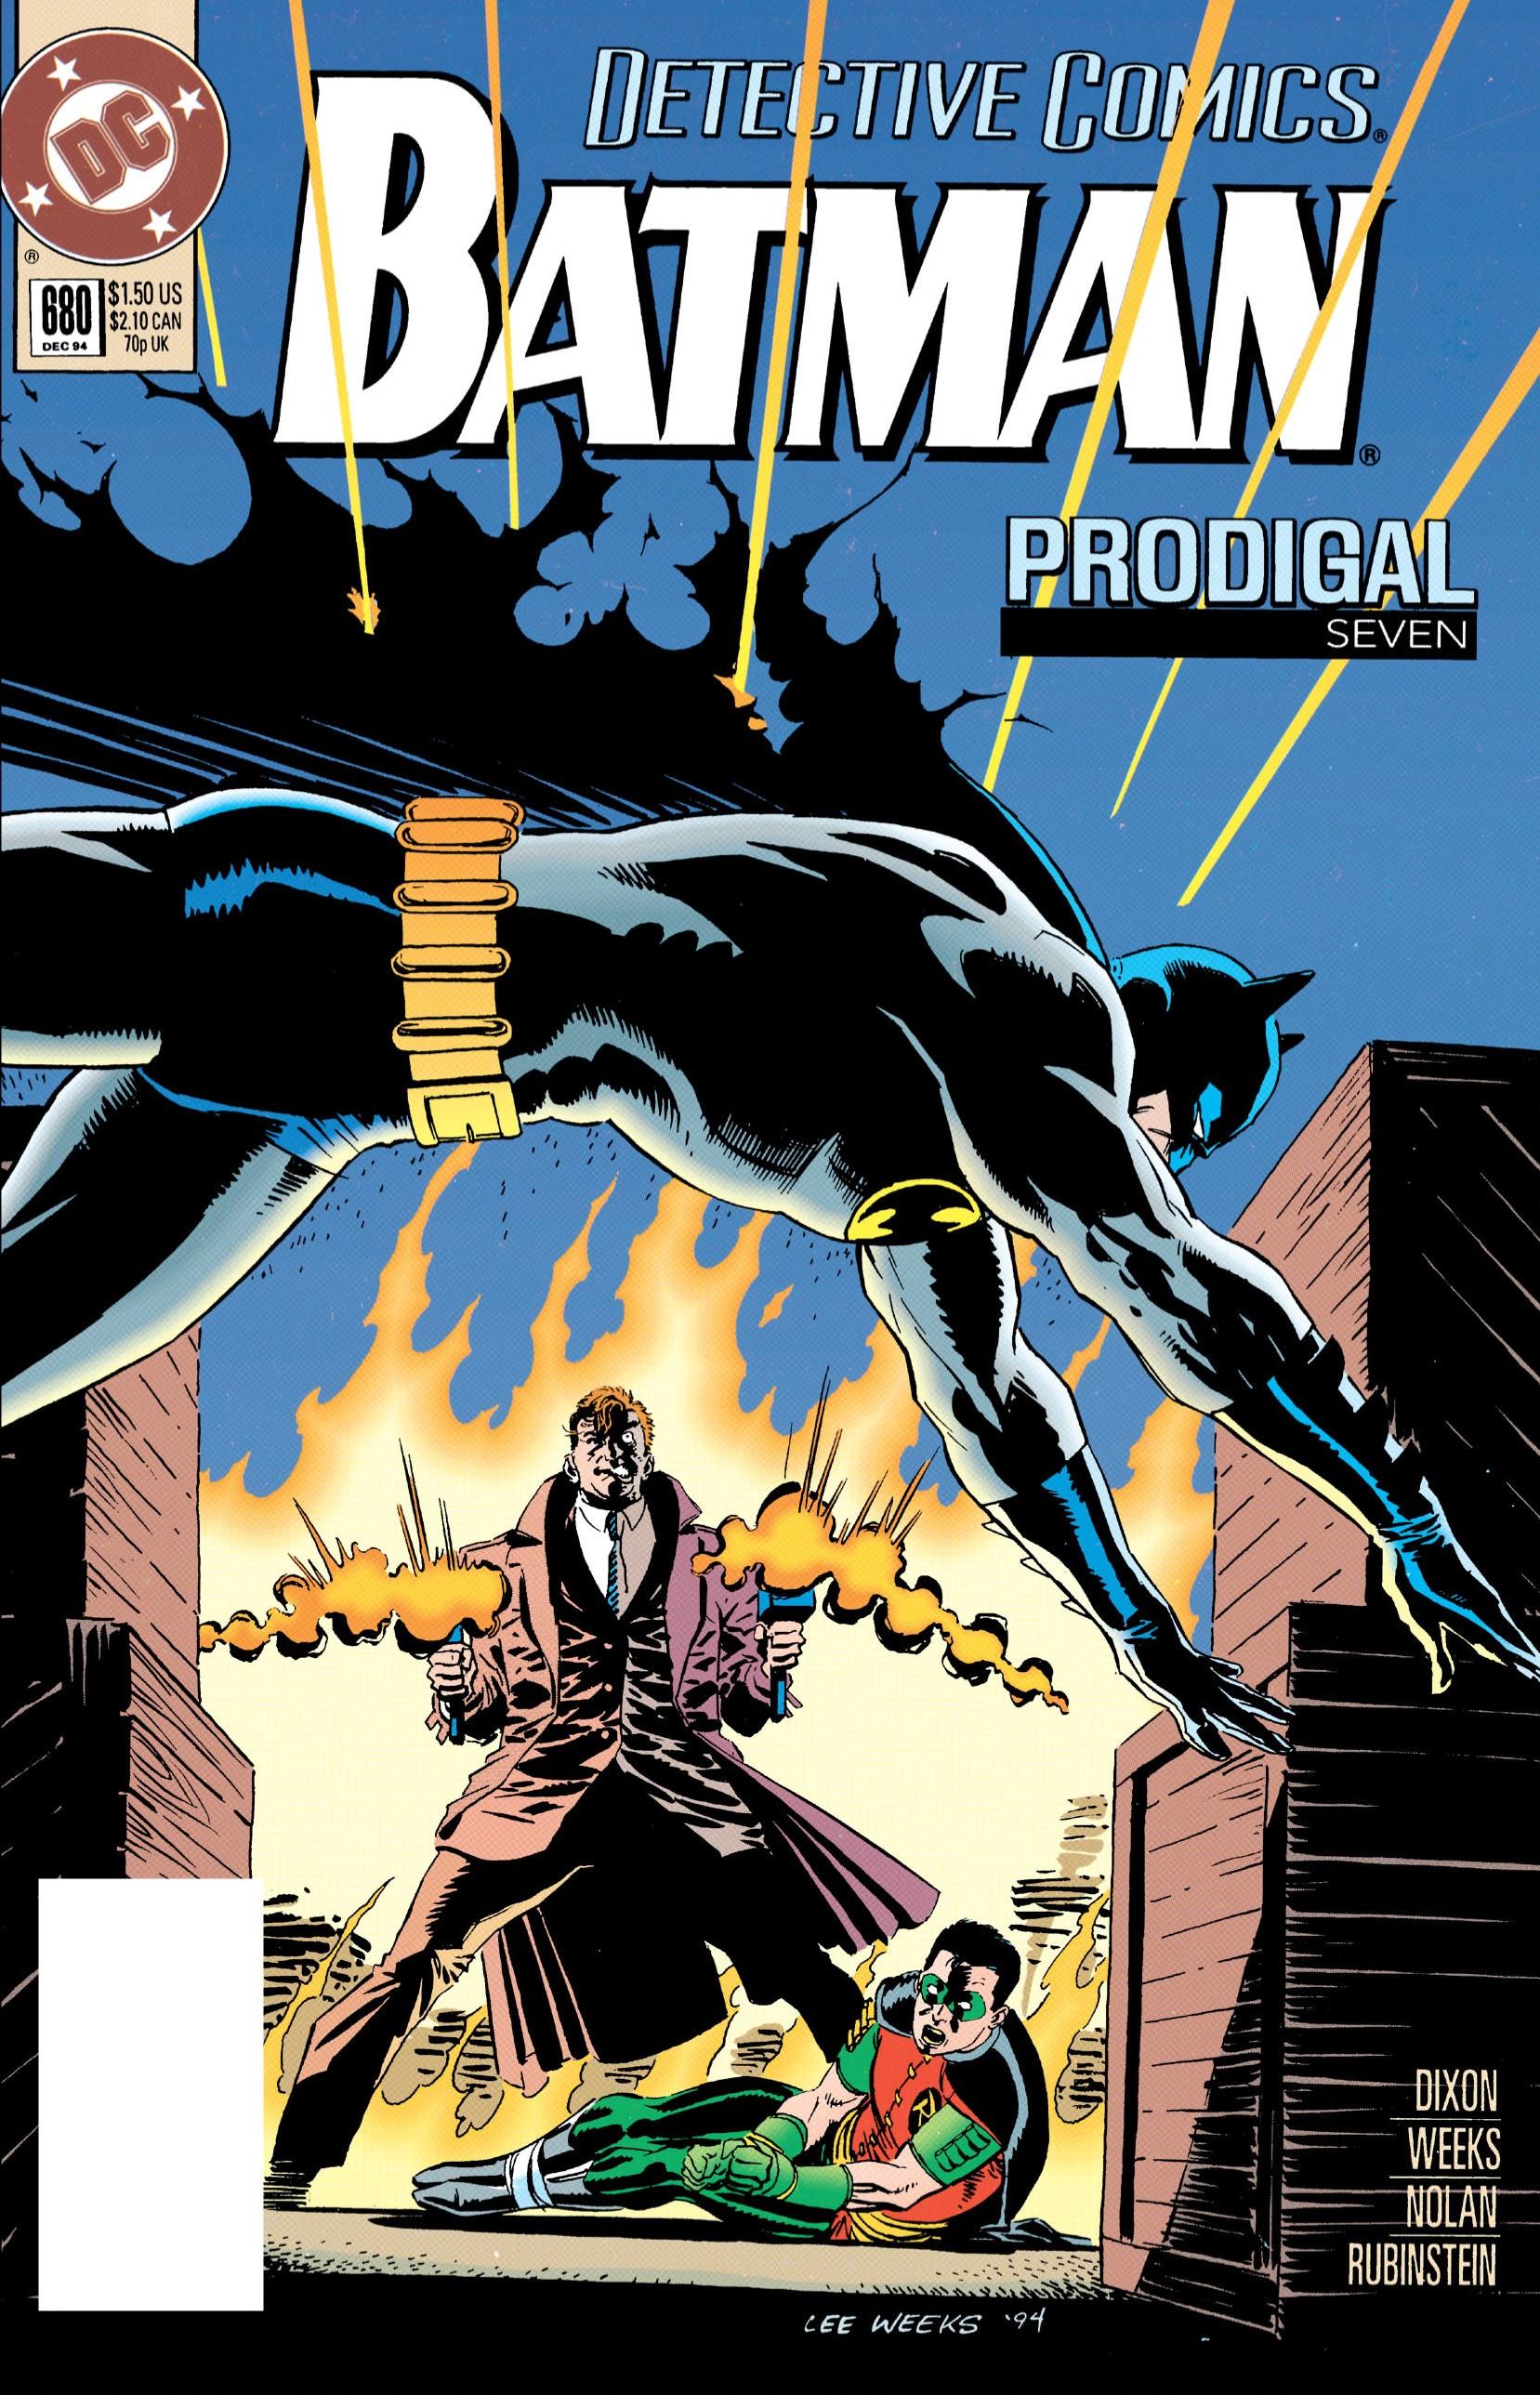 Detective Comics (1937) 680 Page 1